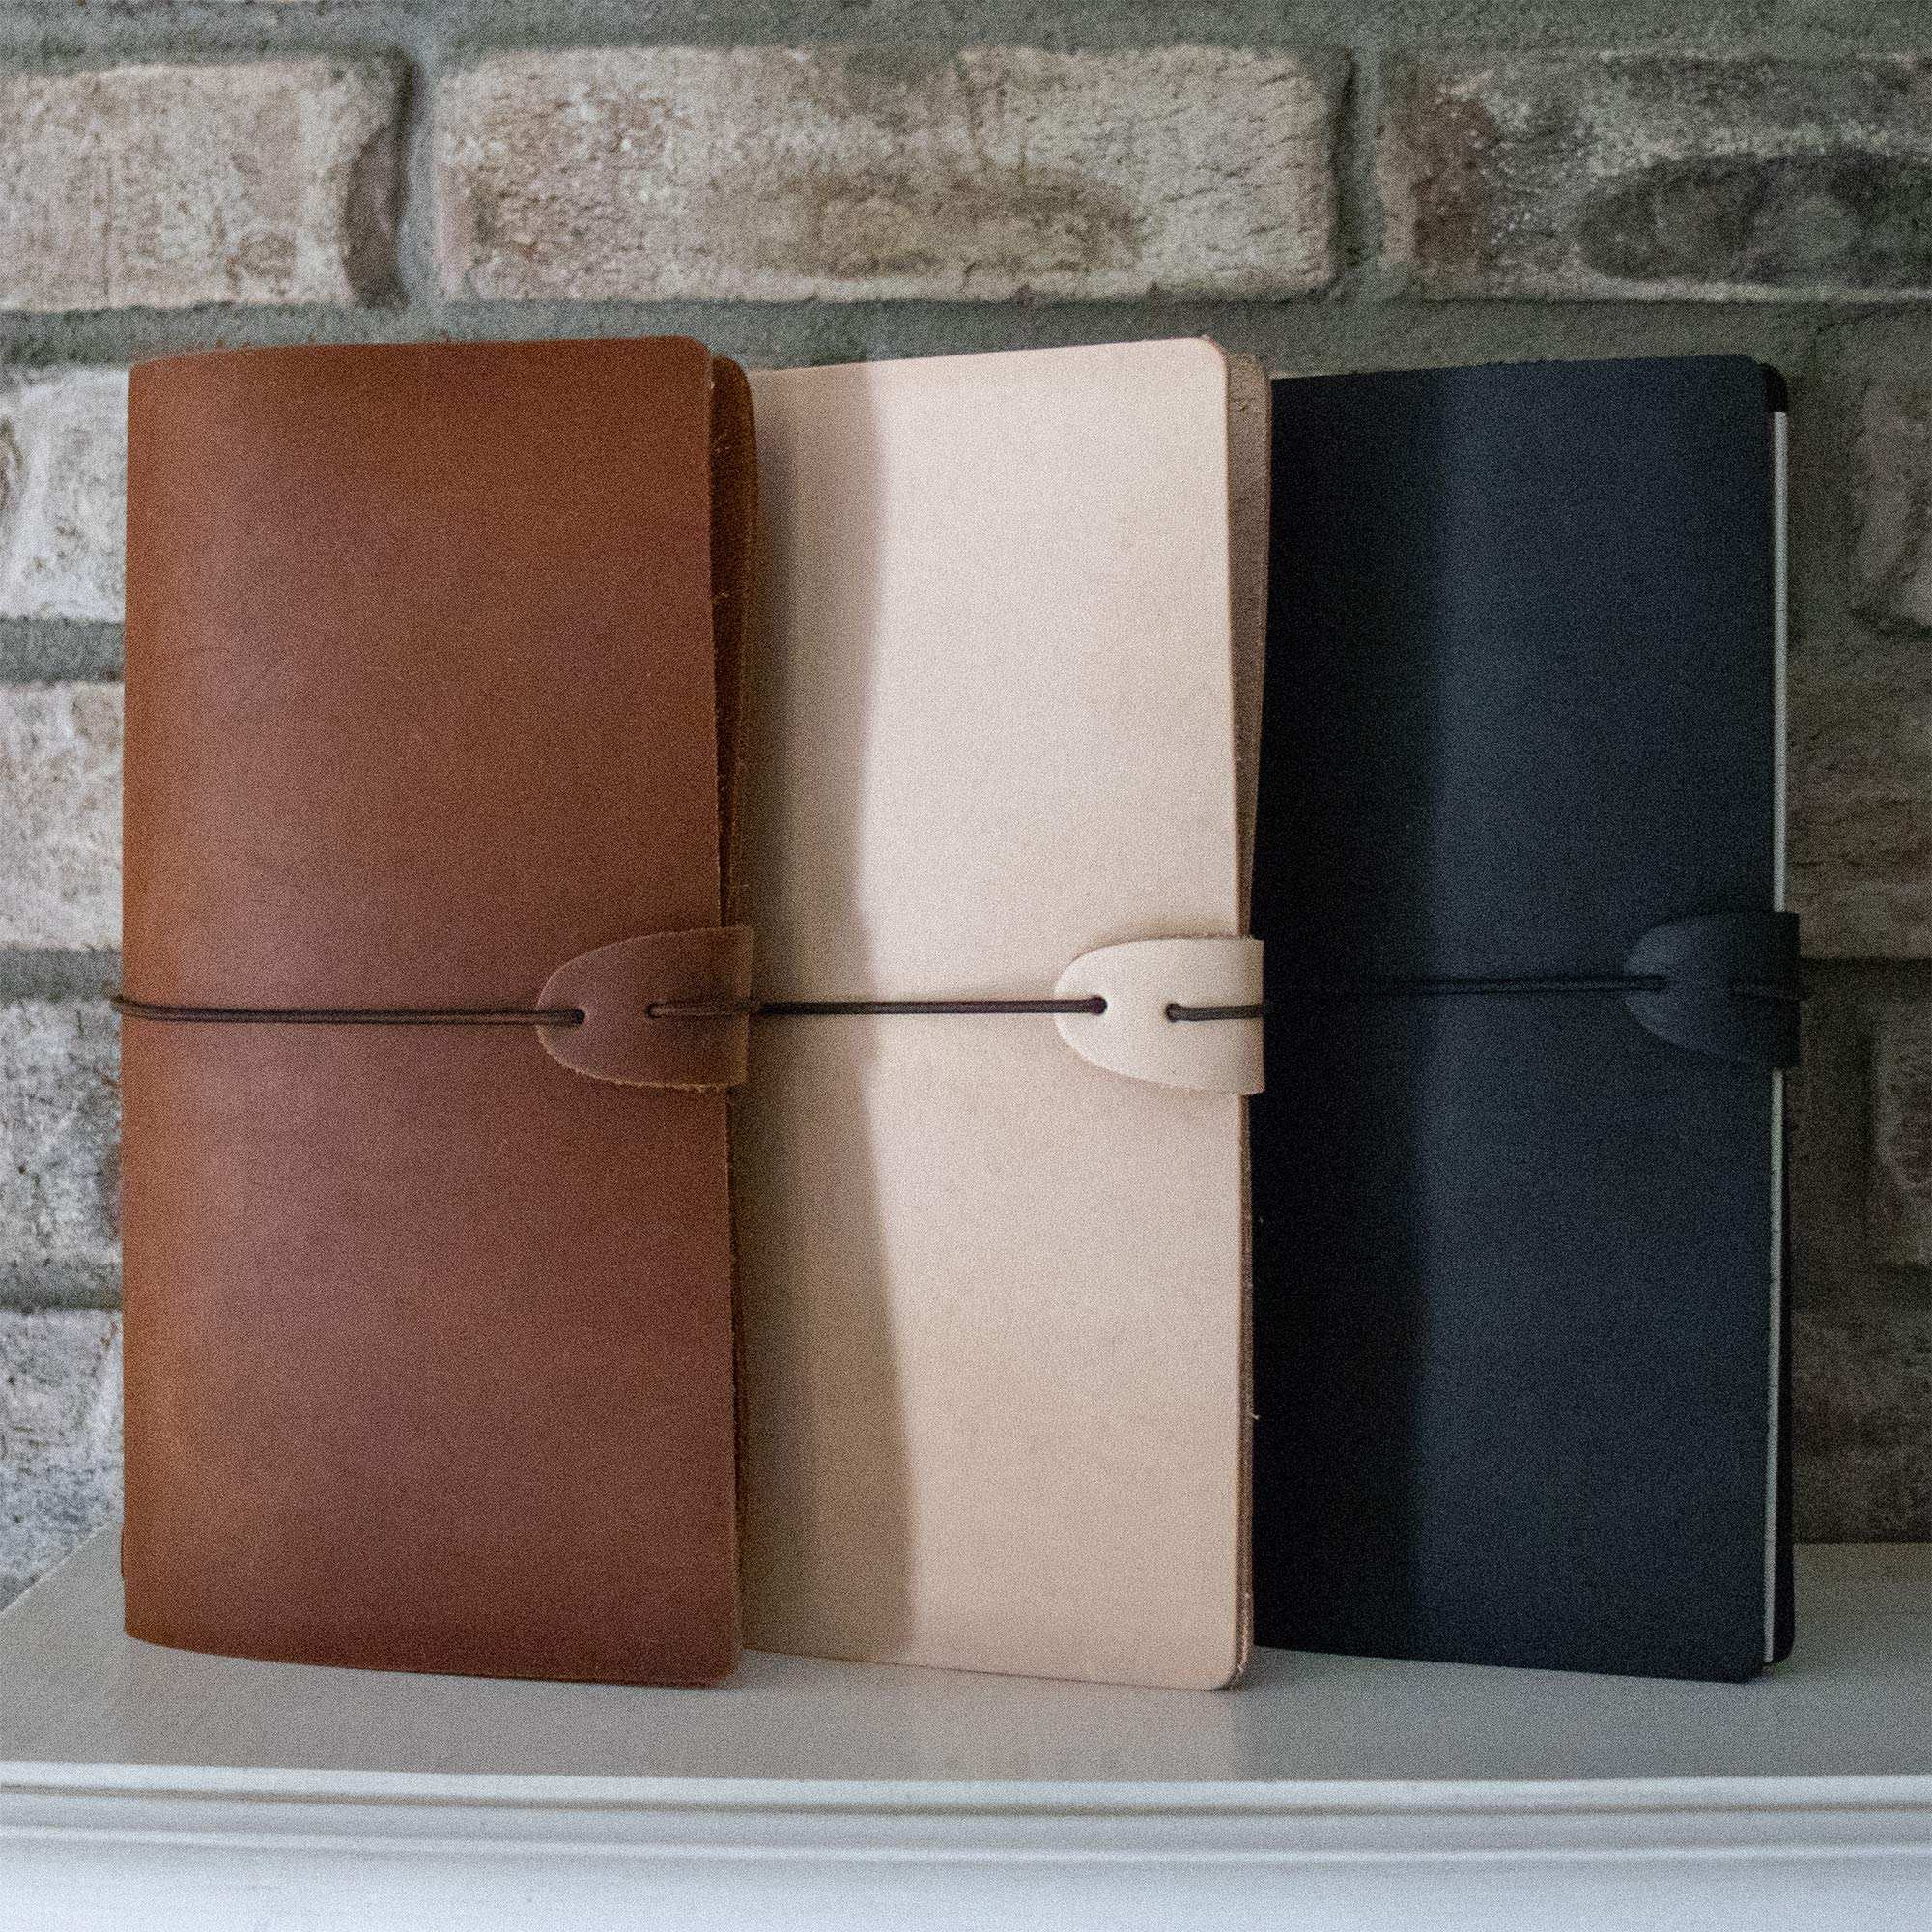 Realeather C4604-02 Leather Moccasin Kit Size 6//7 Gold